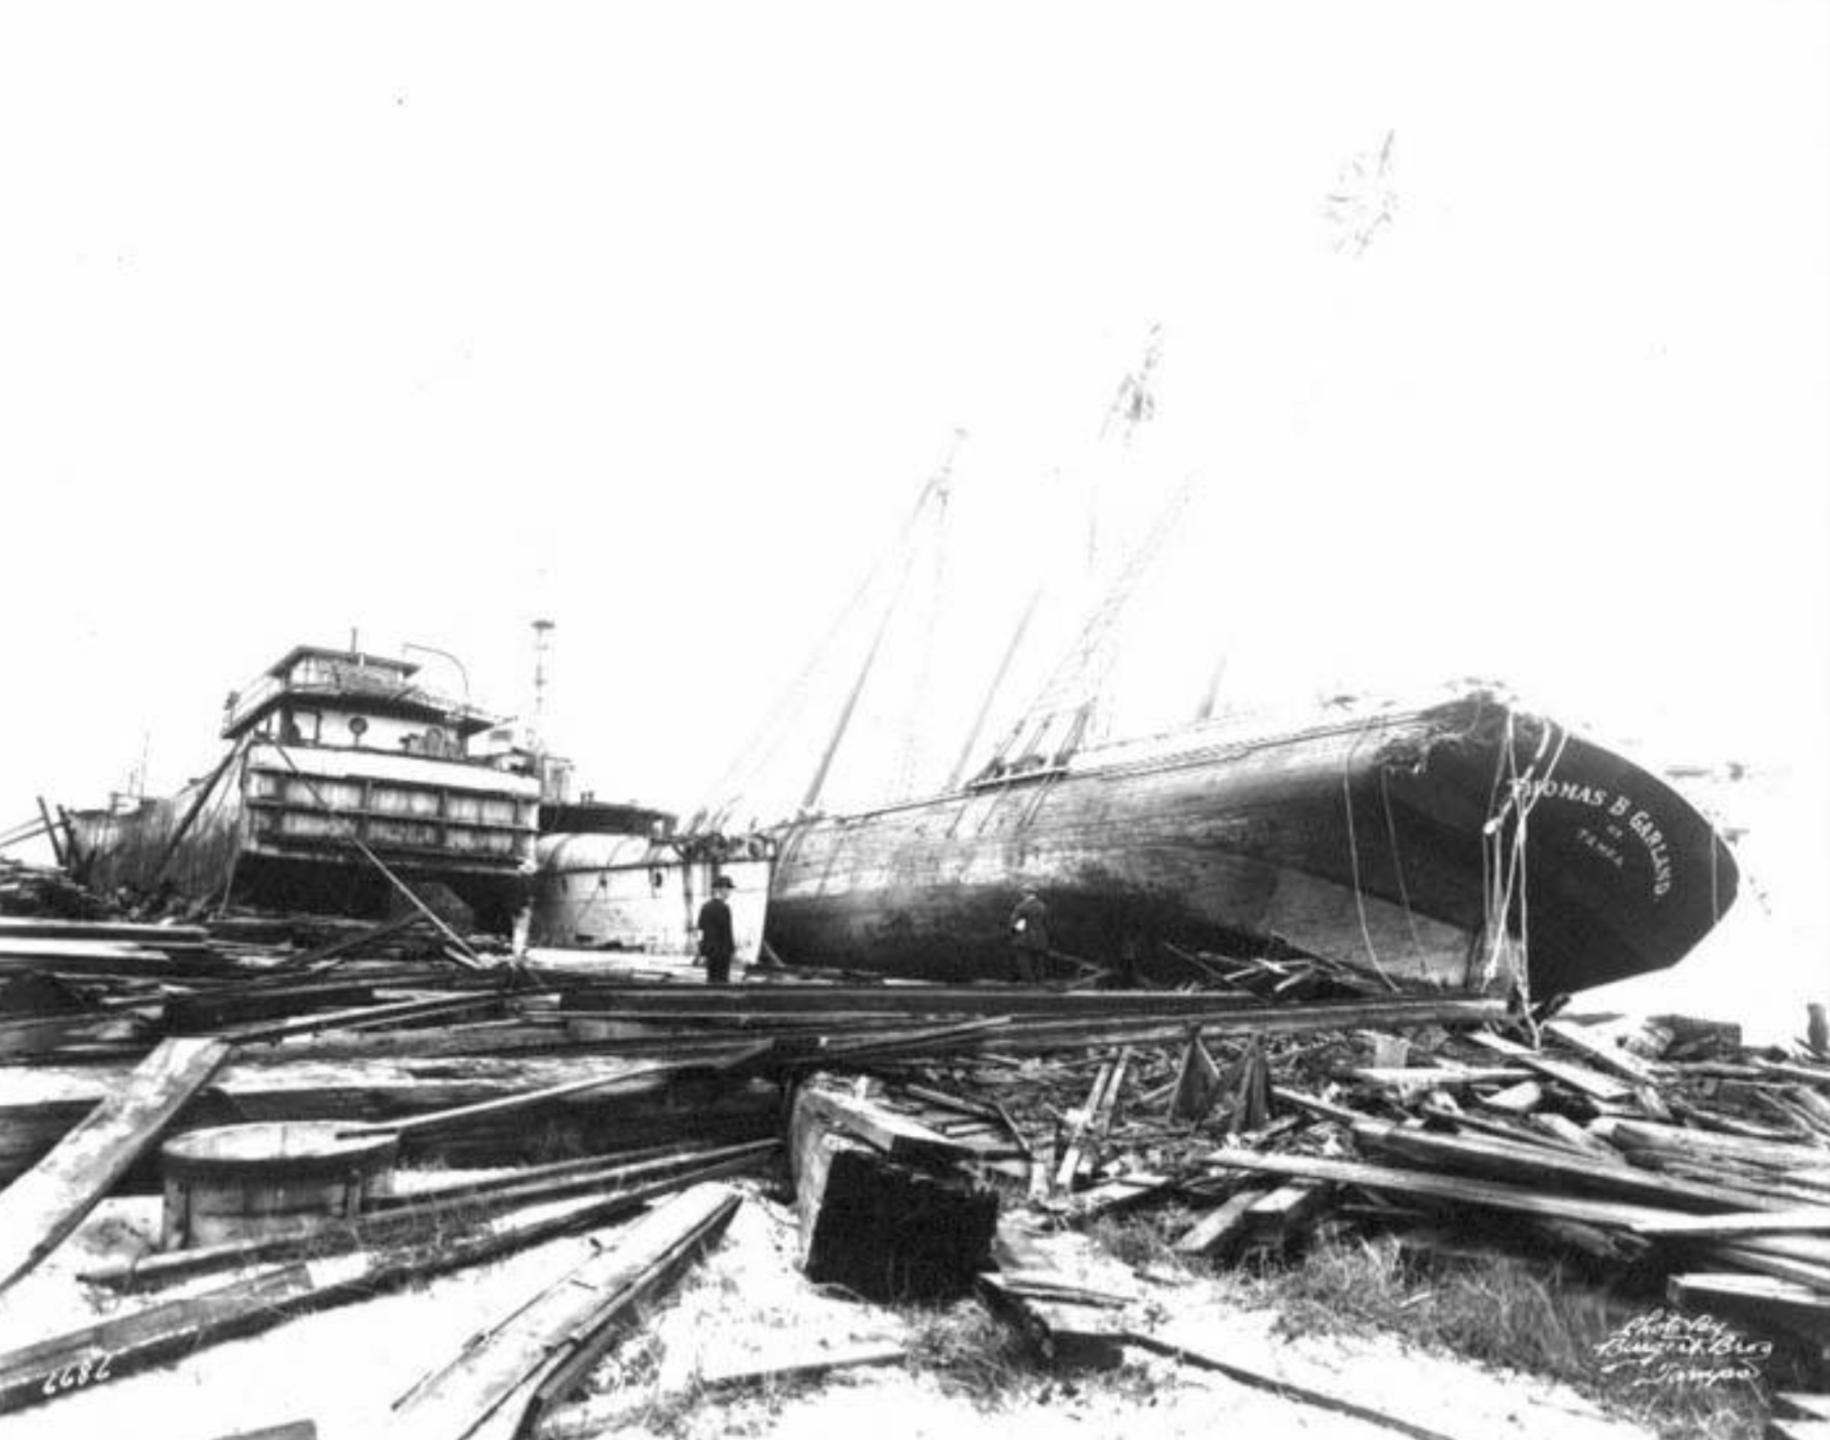 Ship, Thomas B. Garland, and barge washed ashore by hurricane, showing damage to wharf.png